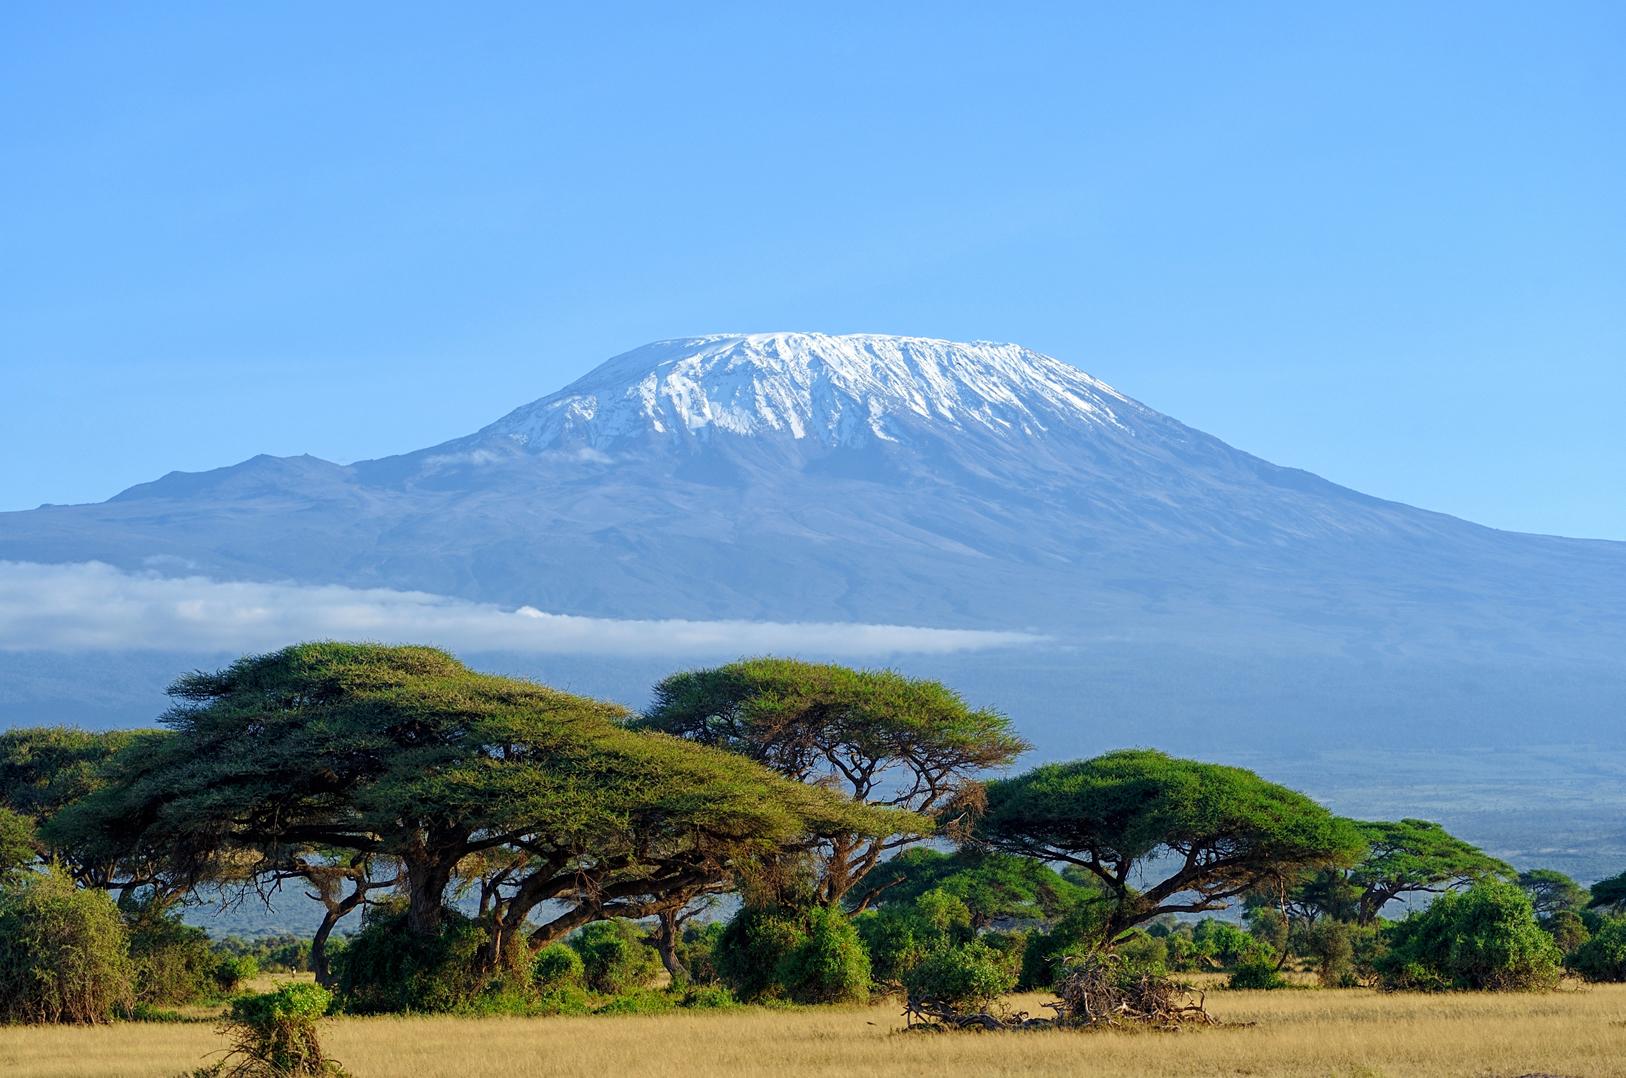 Tanzania Background pic